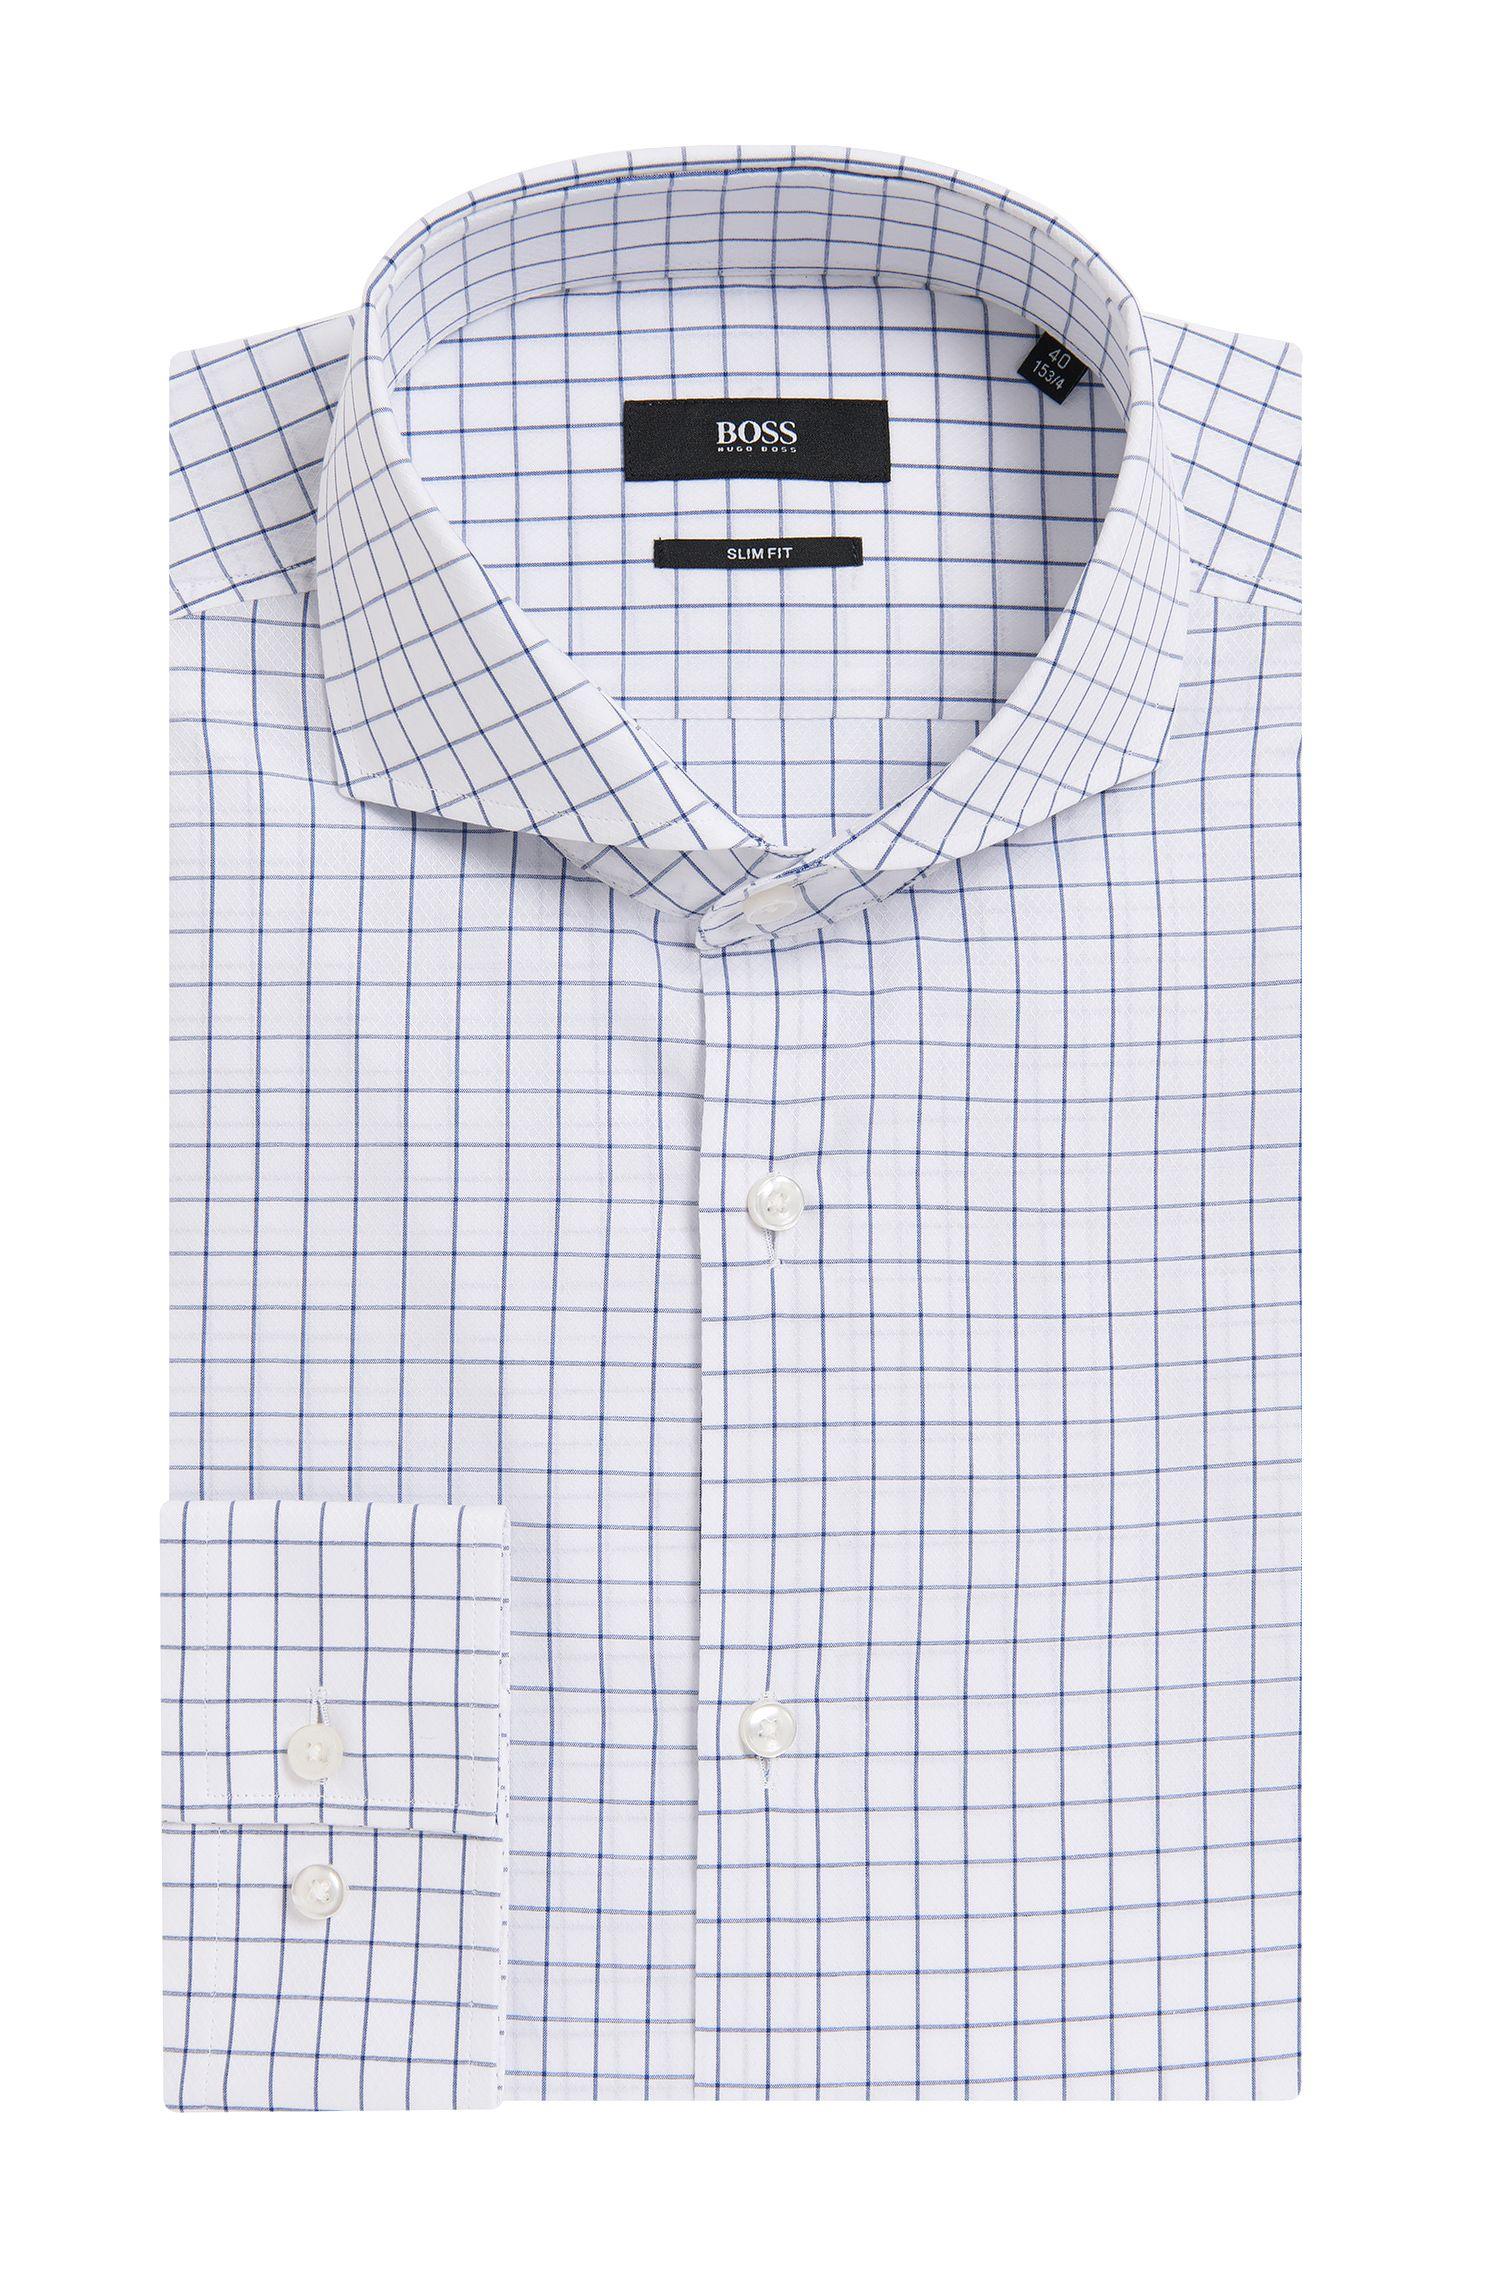 'Dwayne' | Slim Fit, Italian Cotton Textured Dress Shirt